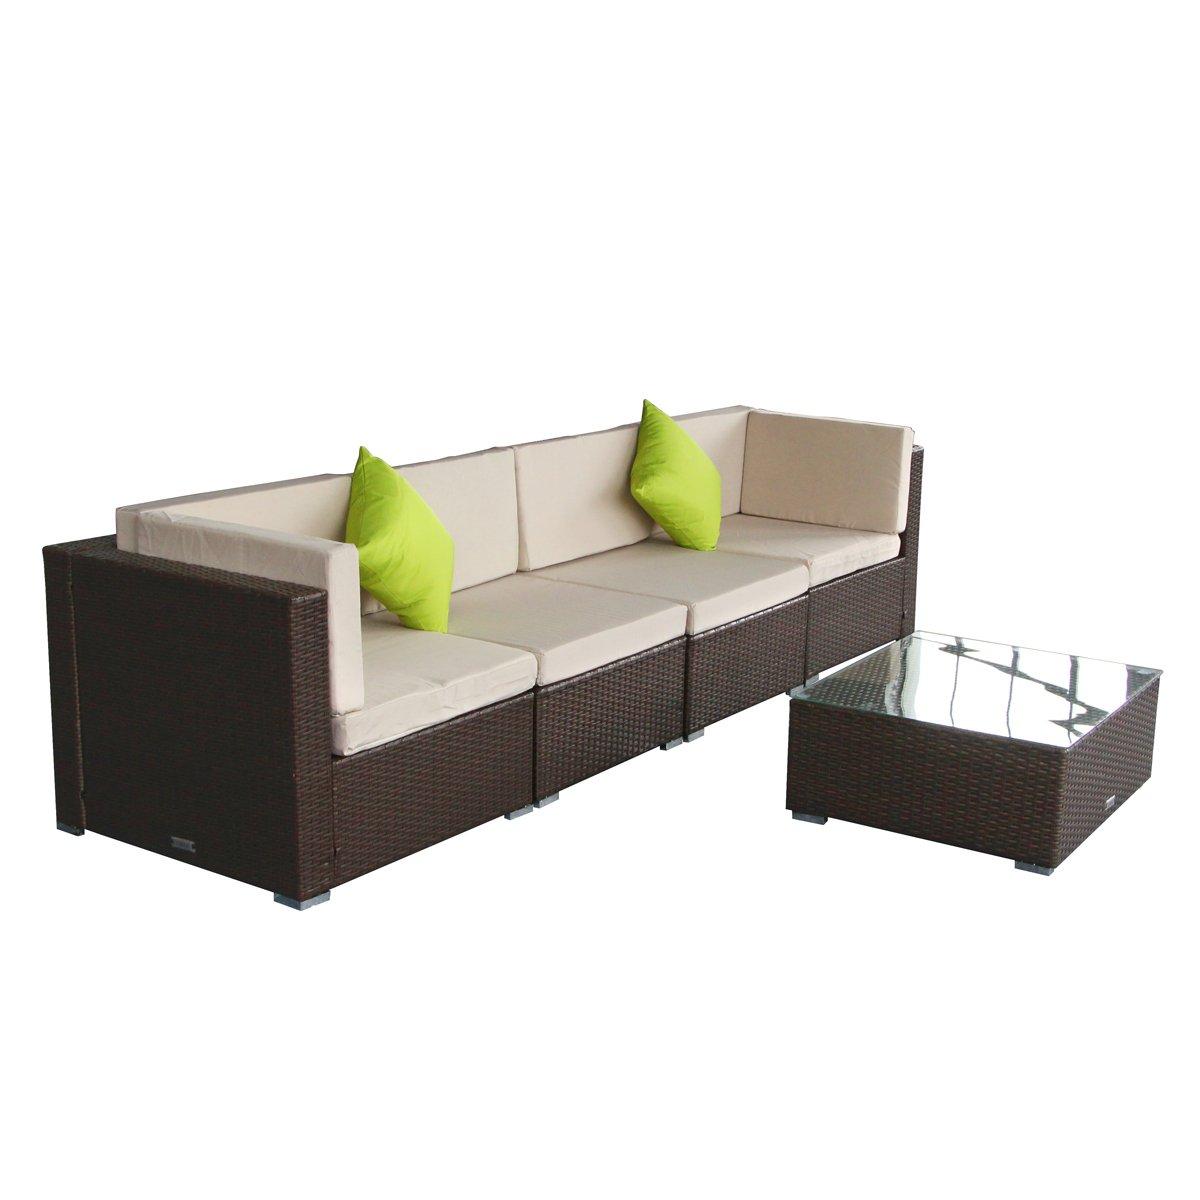 AECOJOY Wicker Furniture Set 5 B pcs Patio PE Rattan Sectional Sofa Brown